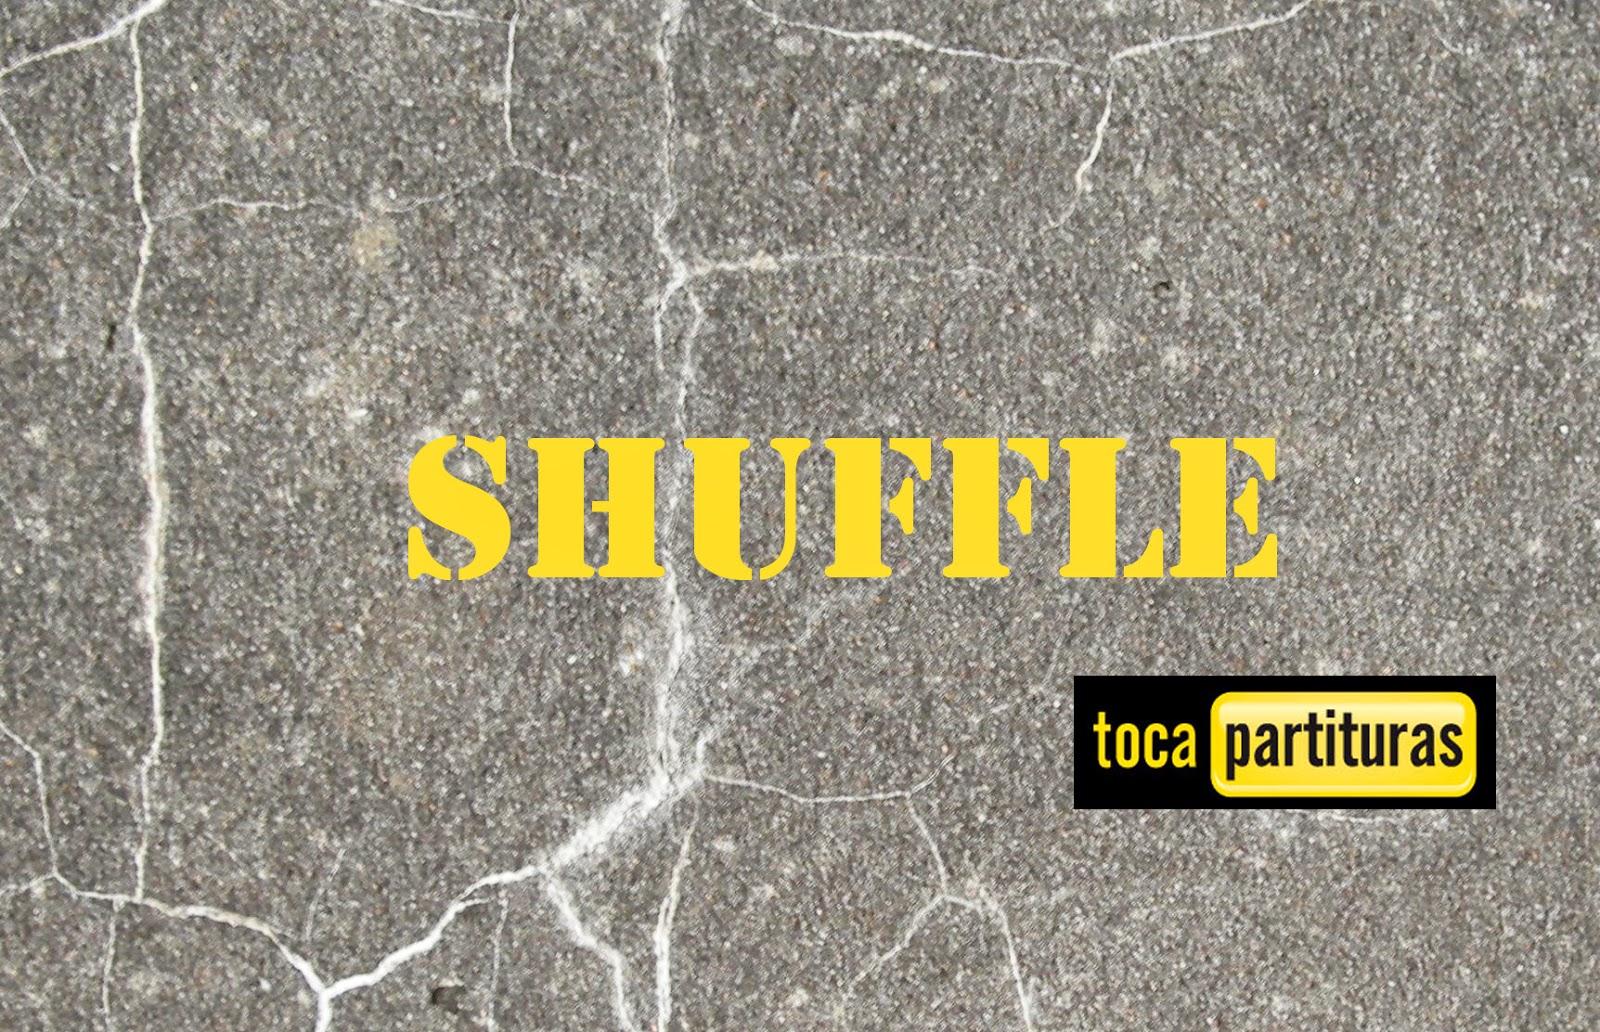 www.tocapartituras.comShuffle Partitura de Batería fácil para principiantes Shuffle Sheet Music for Battery and Drums